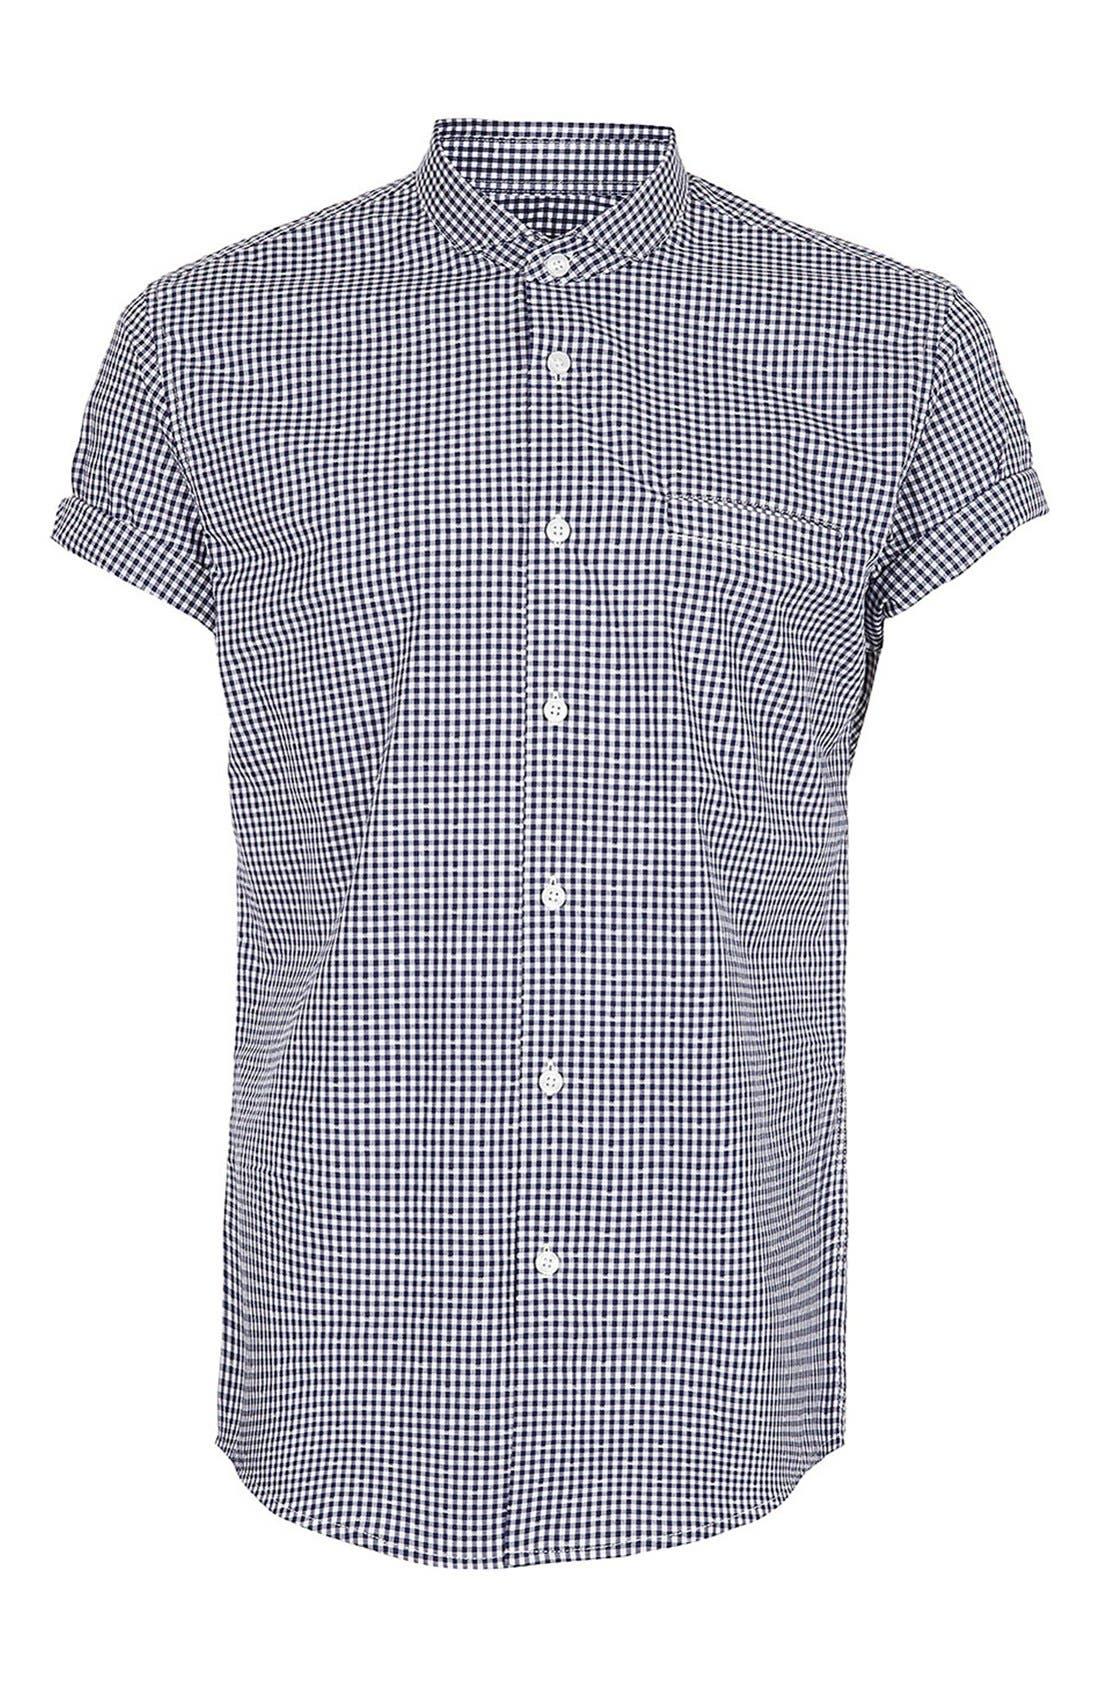 Alternate Image 1 Selected - Topman Short Sleeve Gingham Shirt